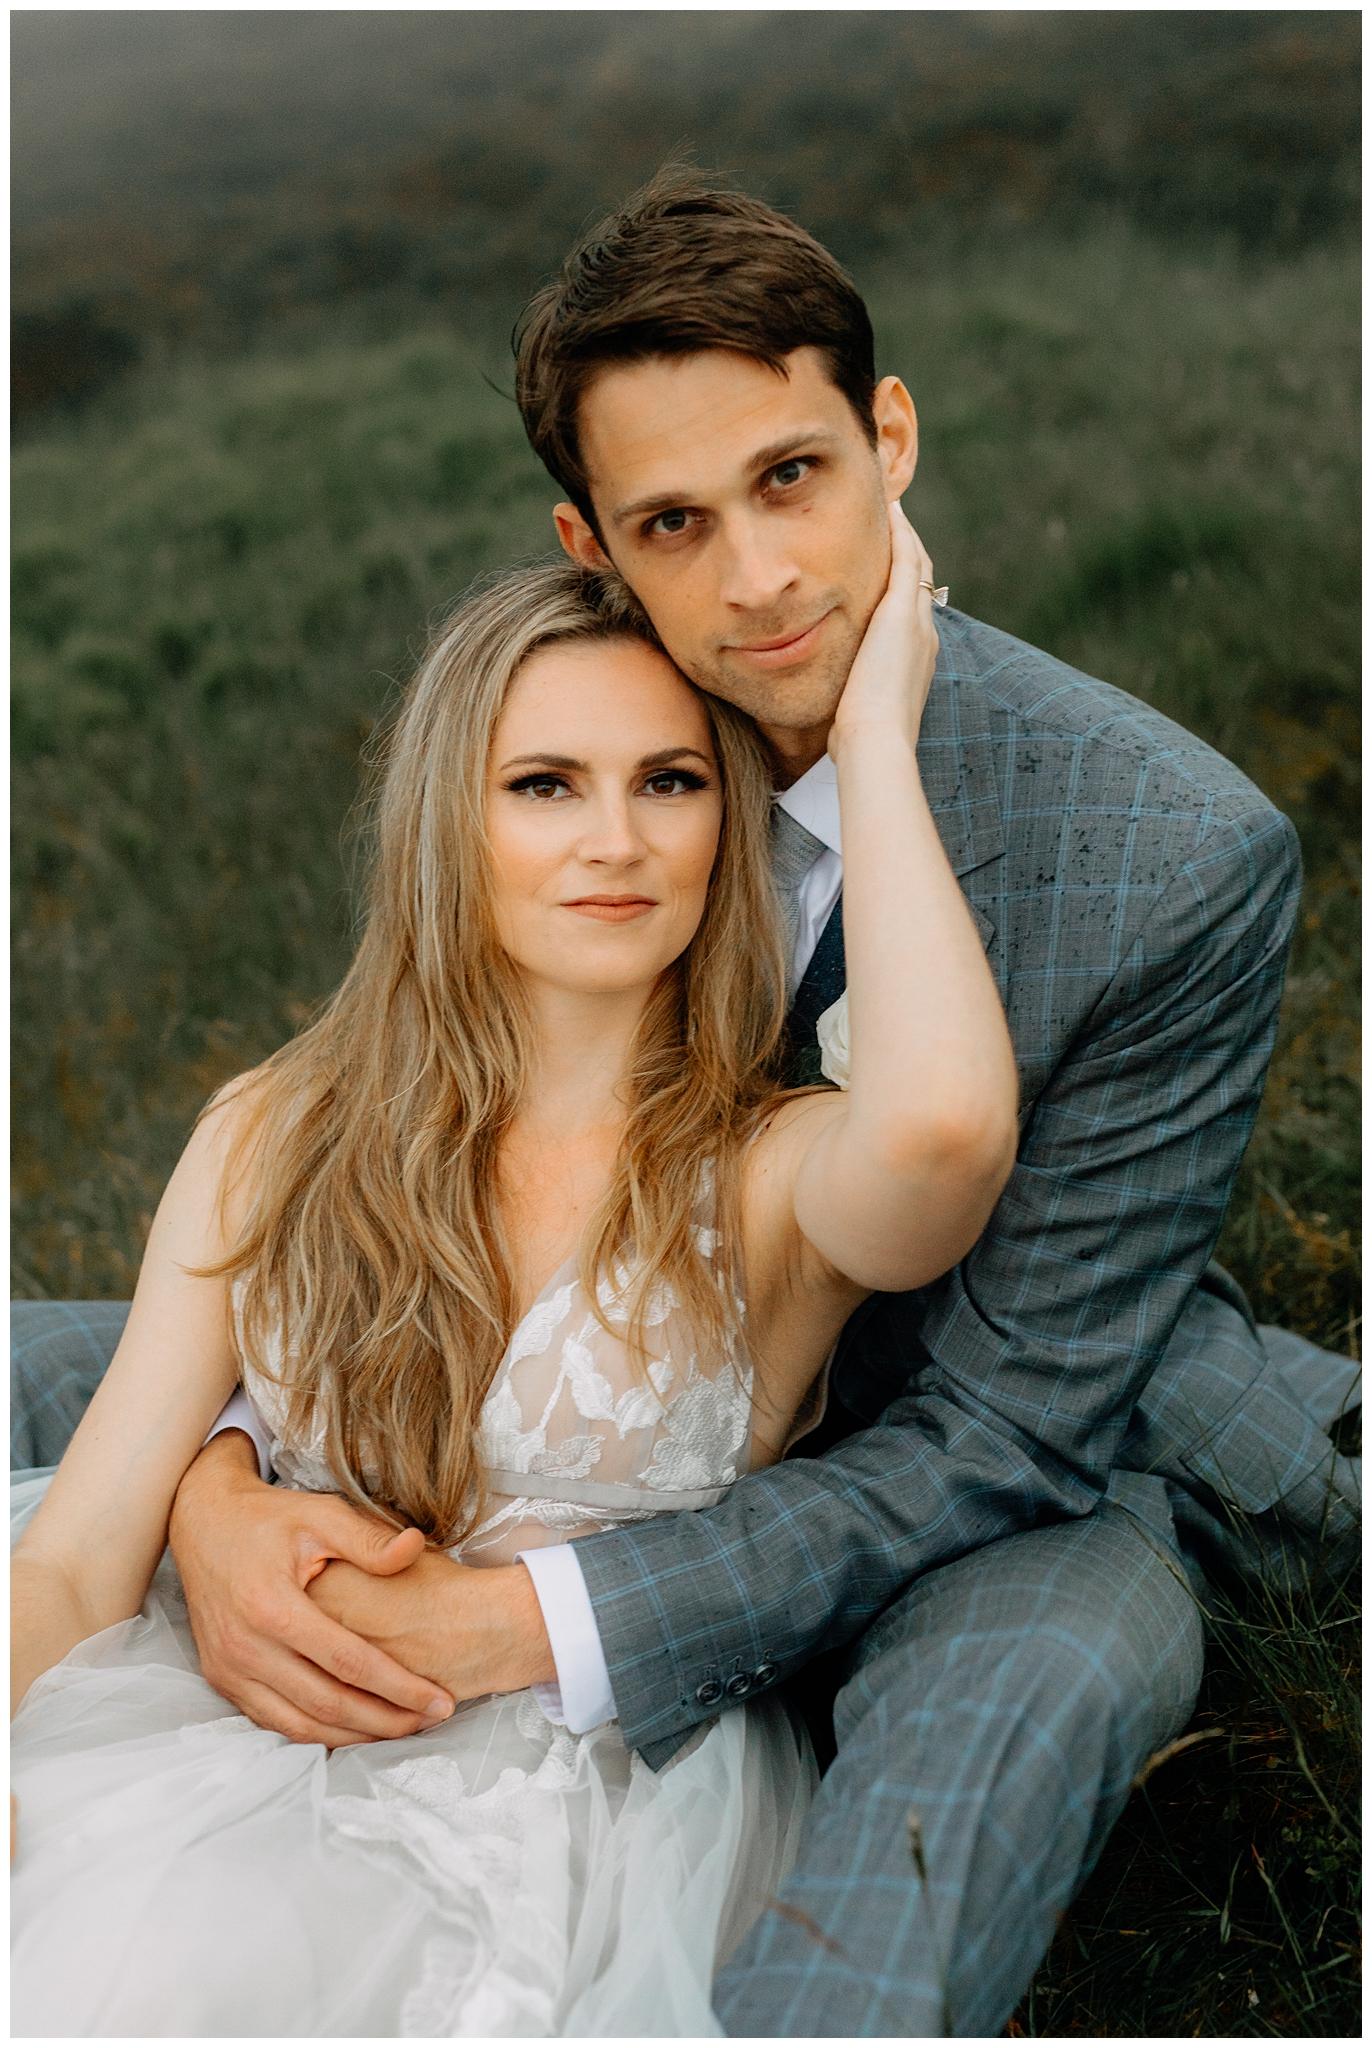 austin-texas-scottish-wedding-bride-groom22016.JPG